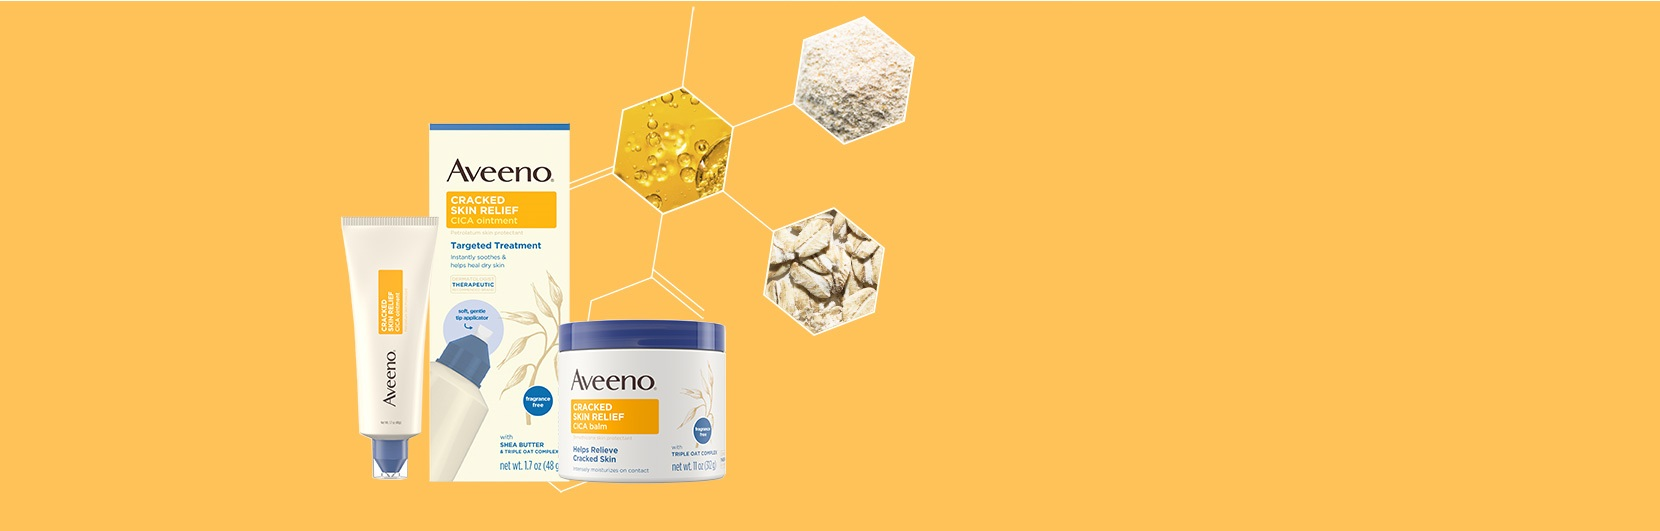 AVEENO® Lotion for Cracked Skin